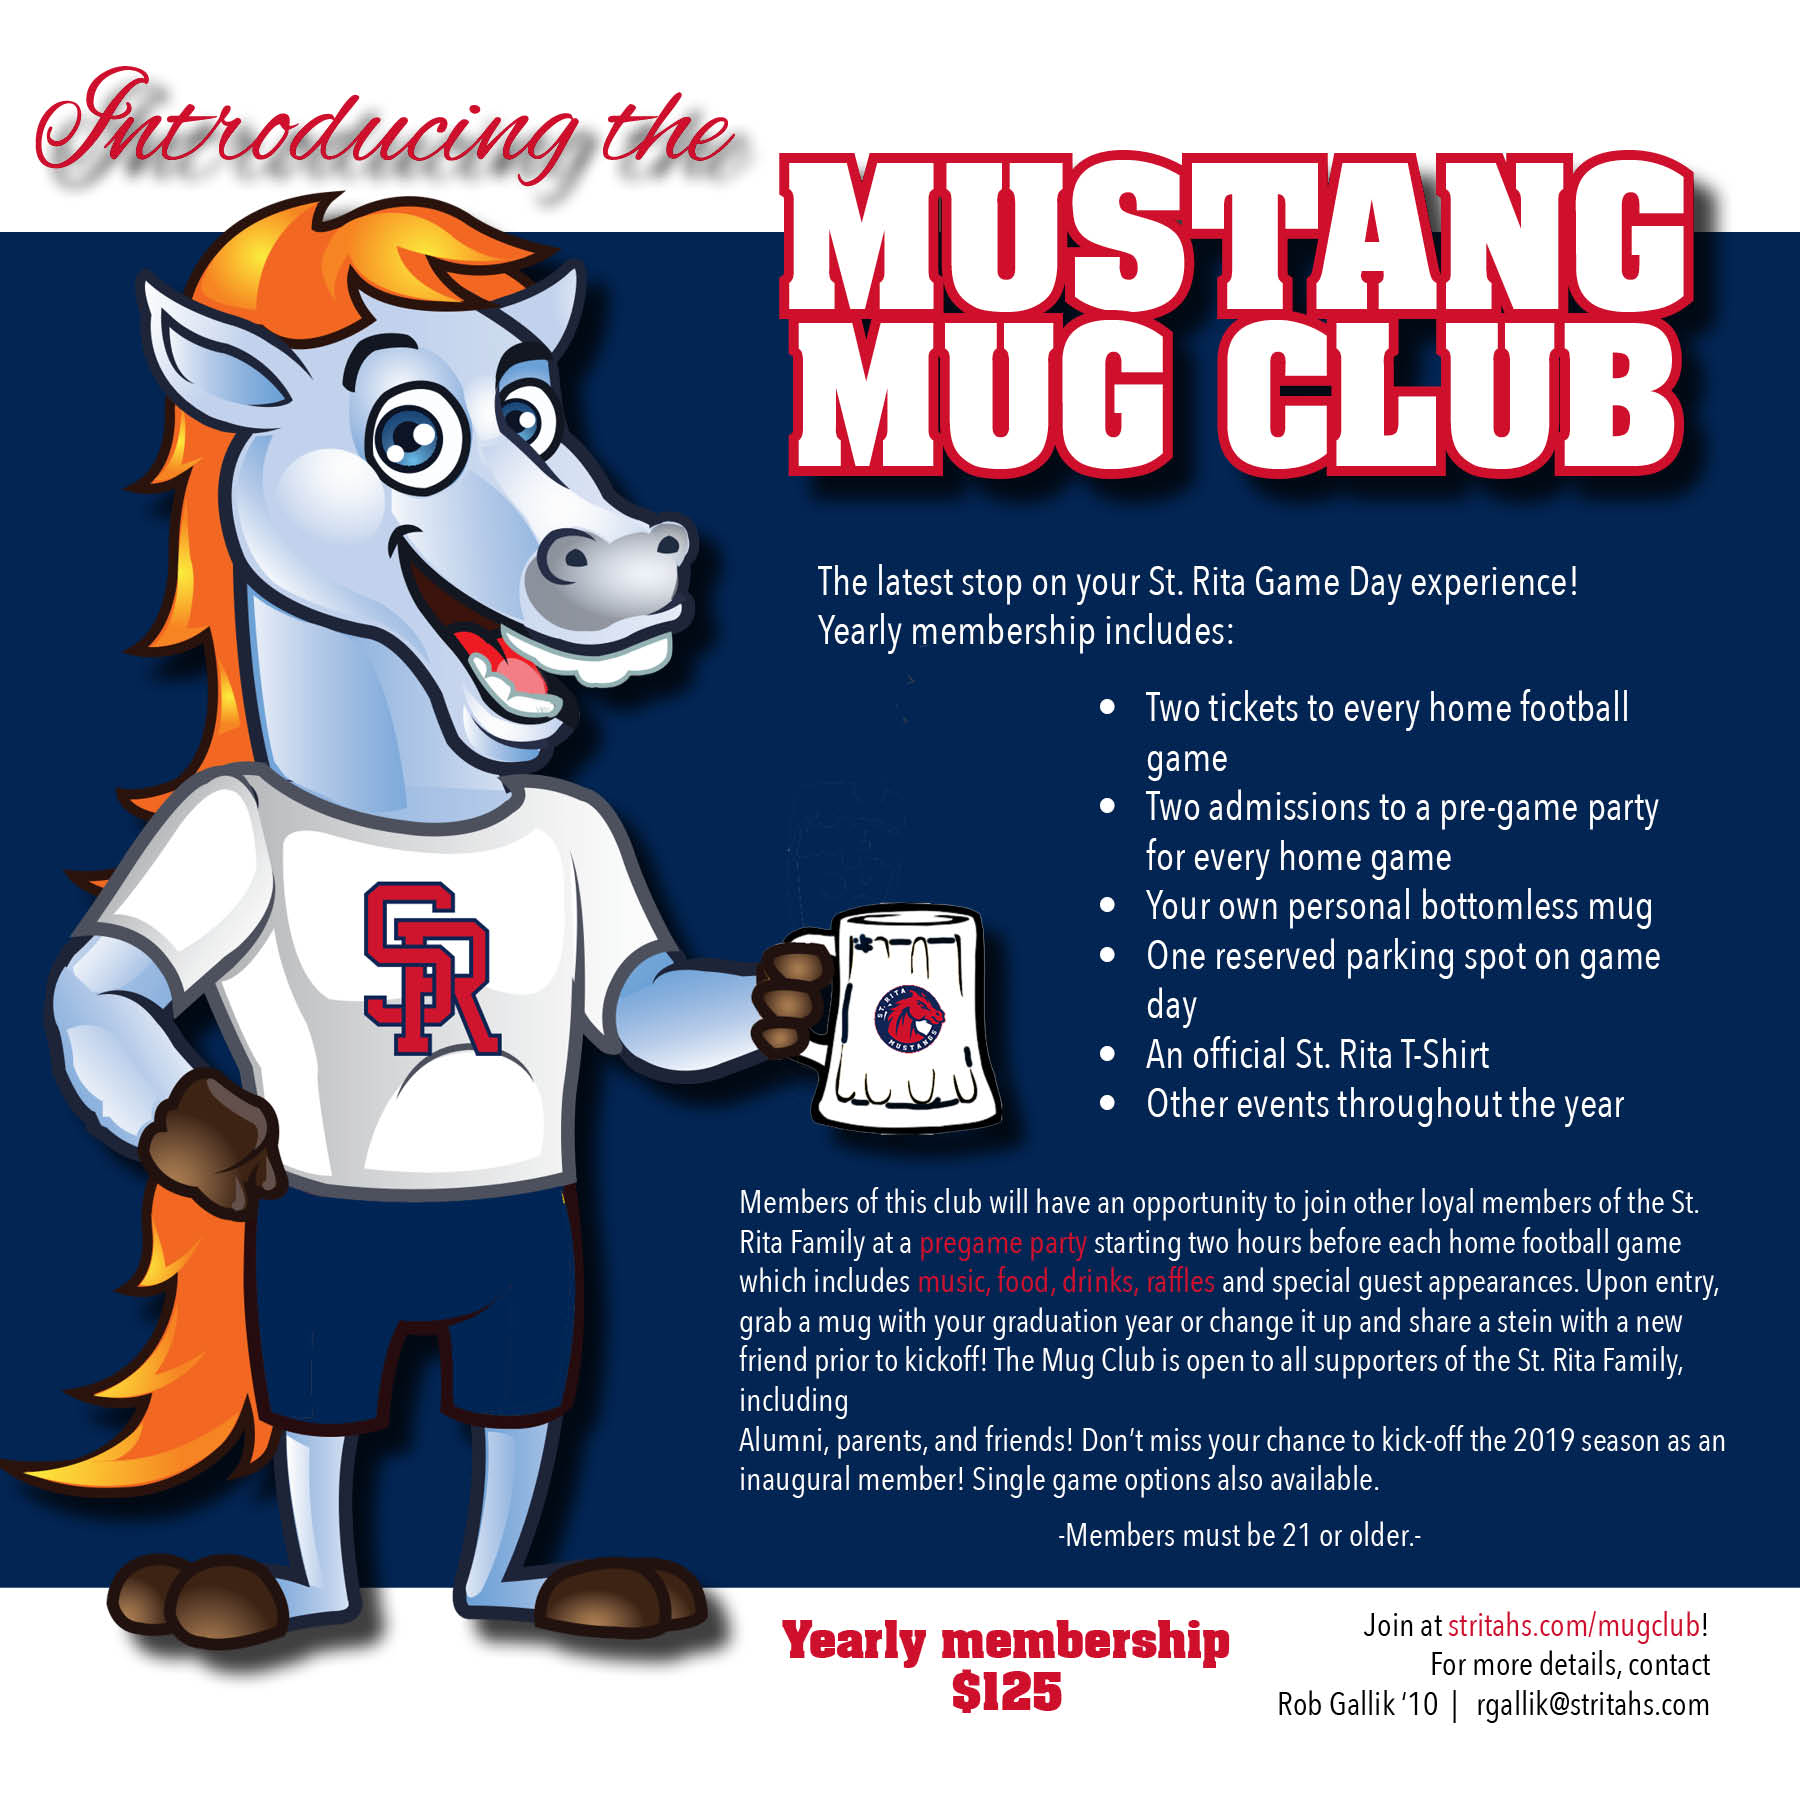 Mustang Mug Club.INSTA and CC.REV1.jpg